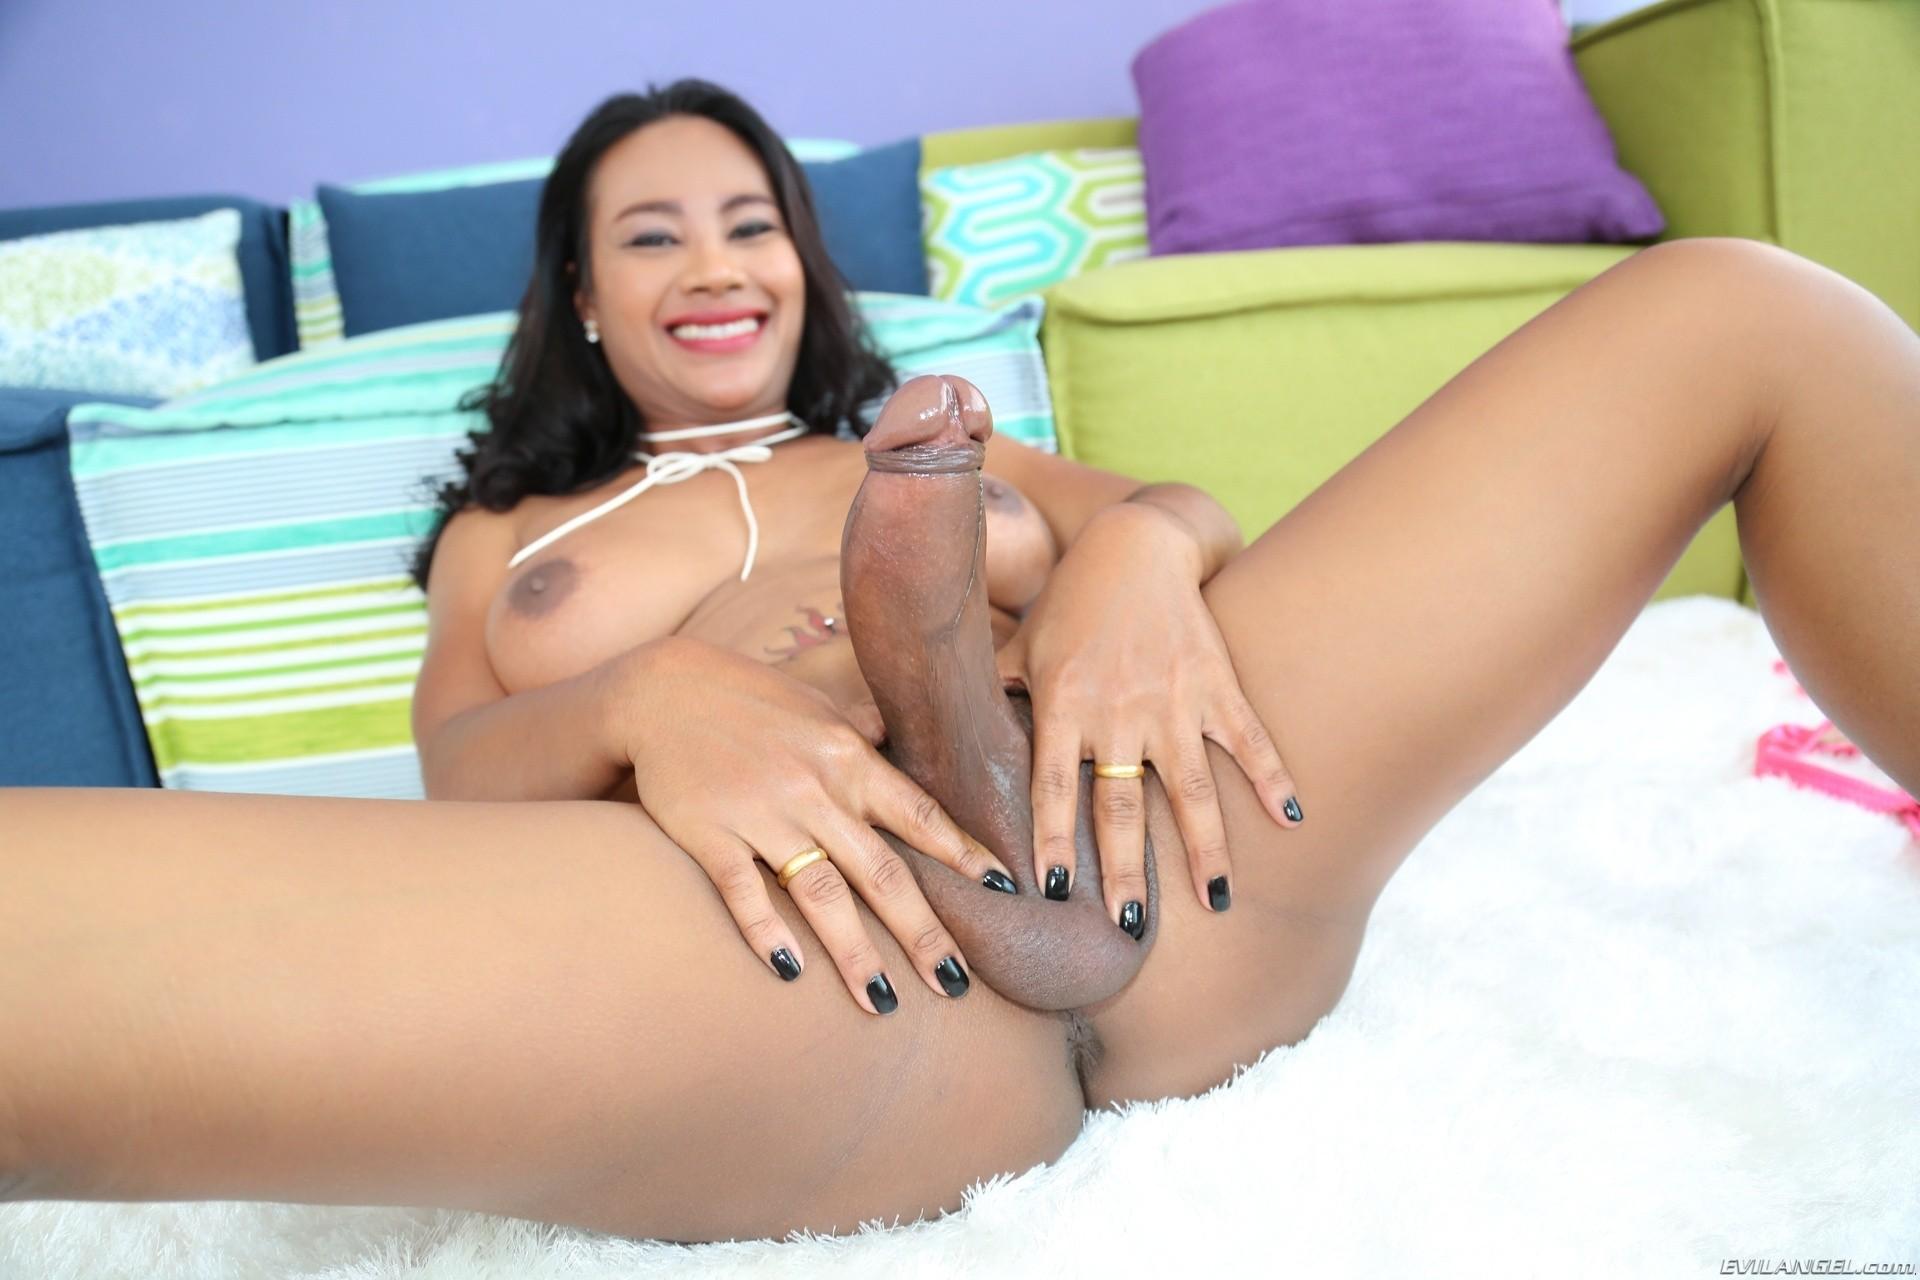 nudes at shopping malls